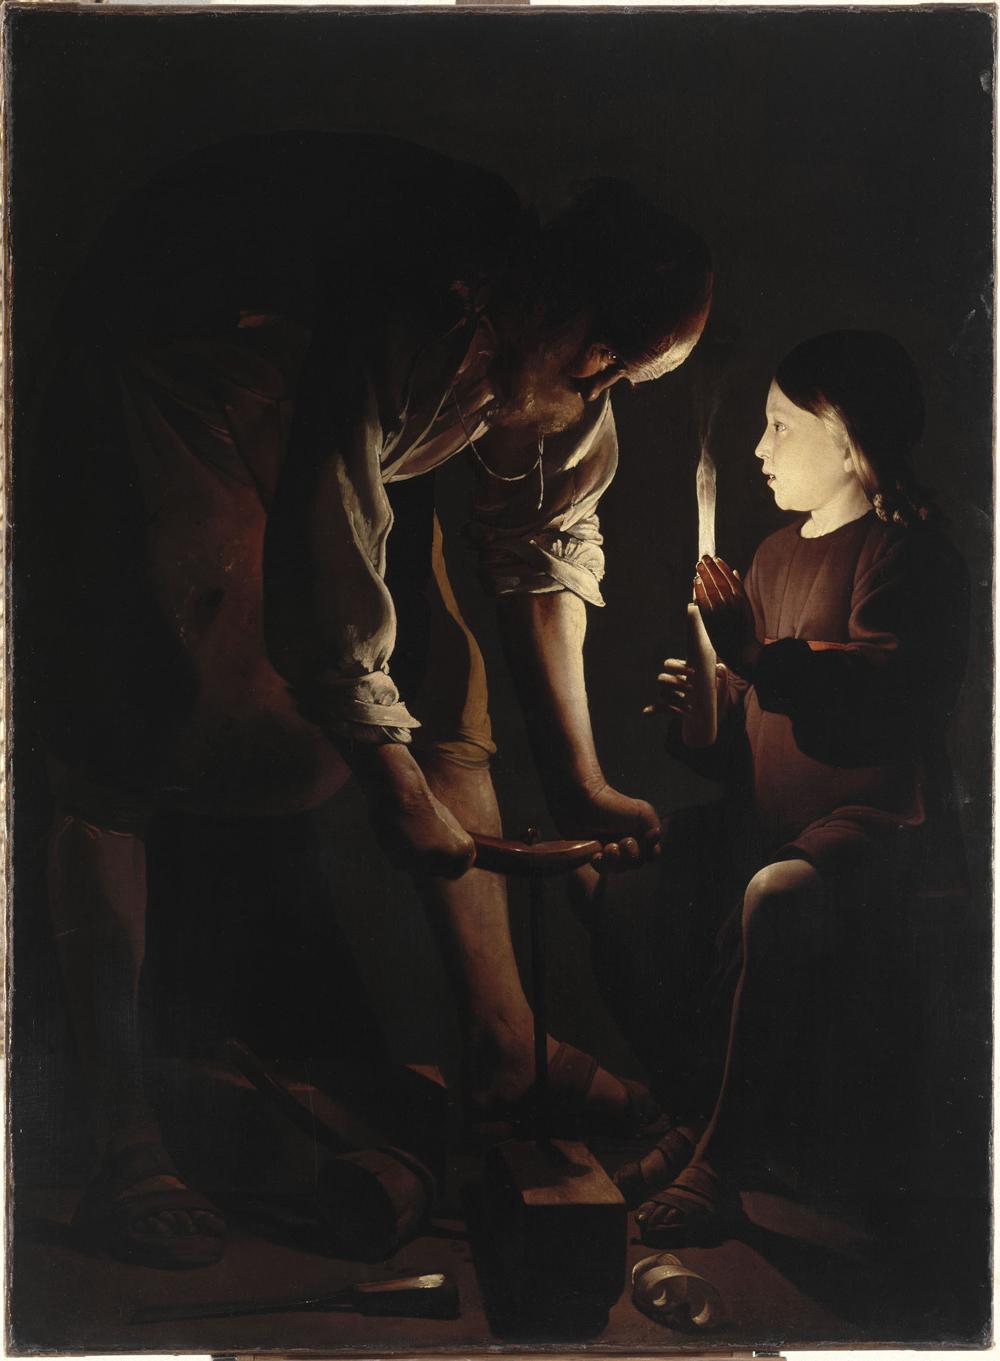 San Giuseppe falegname, George de la Tour